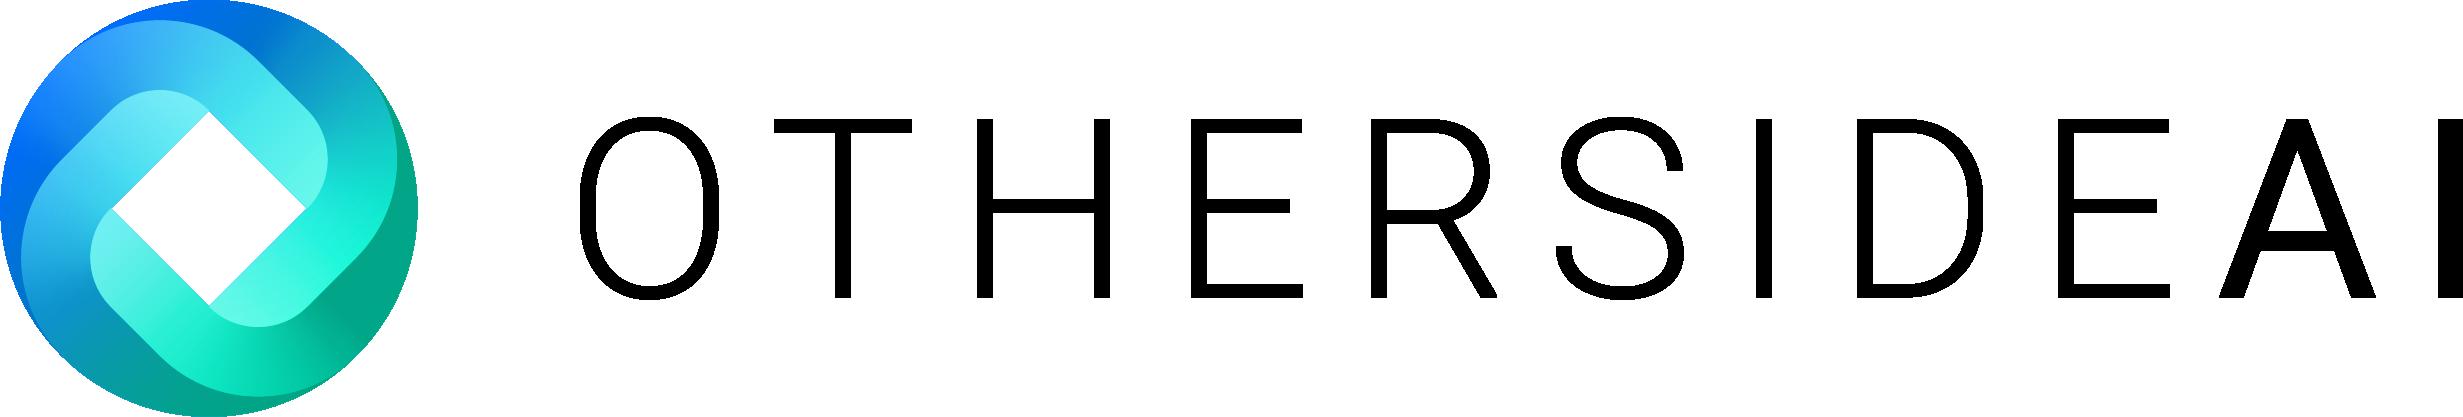 OthersideAI logo